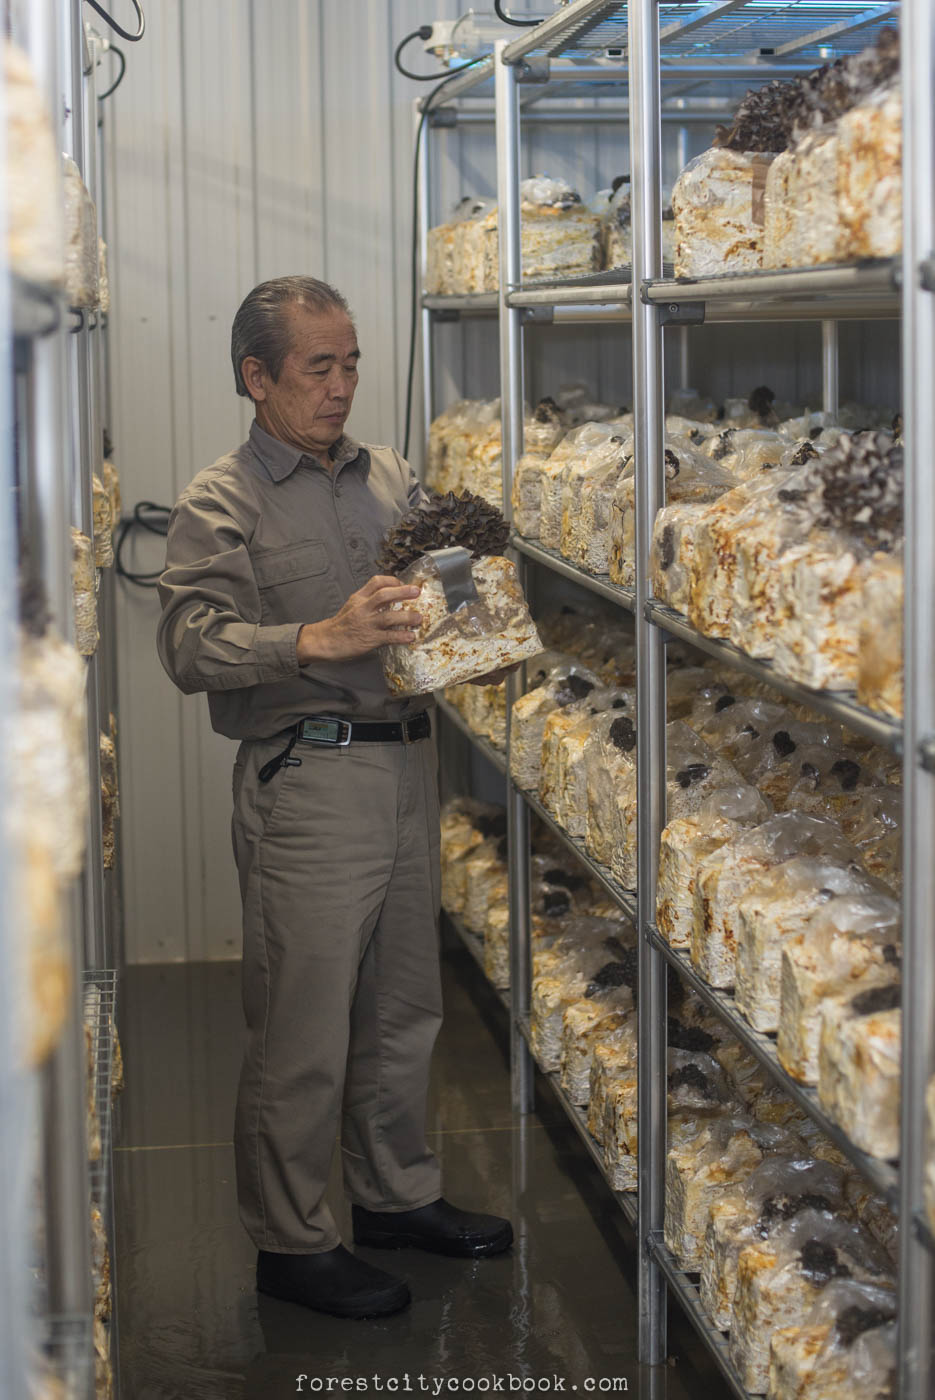 Forest City Cookbook - Shogun Maitake Mushroom